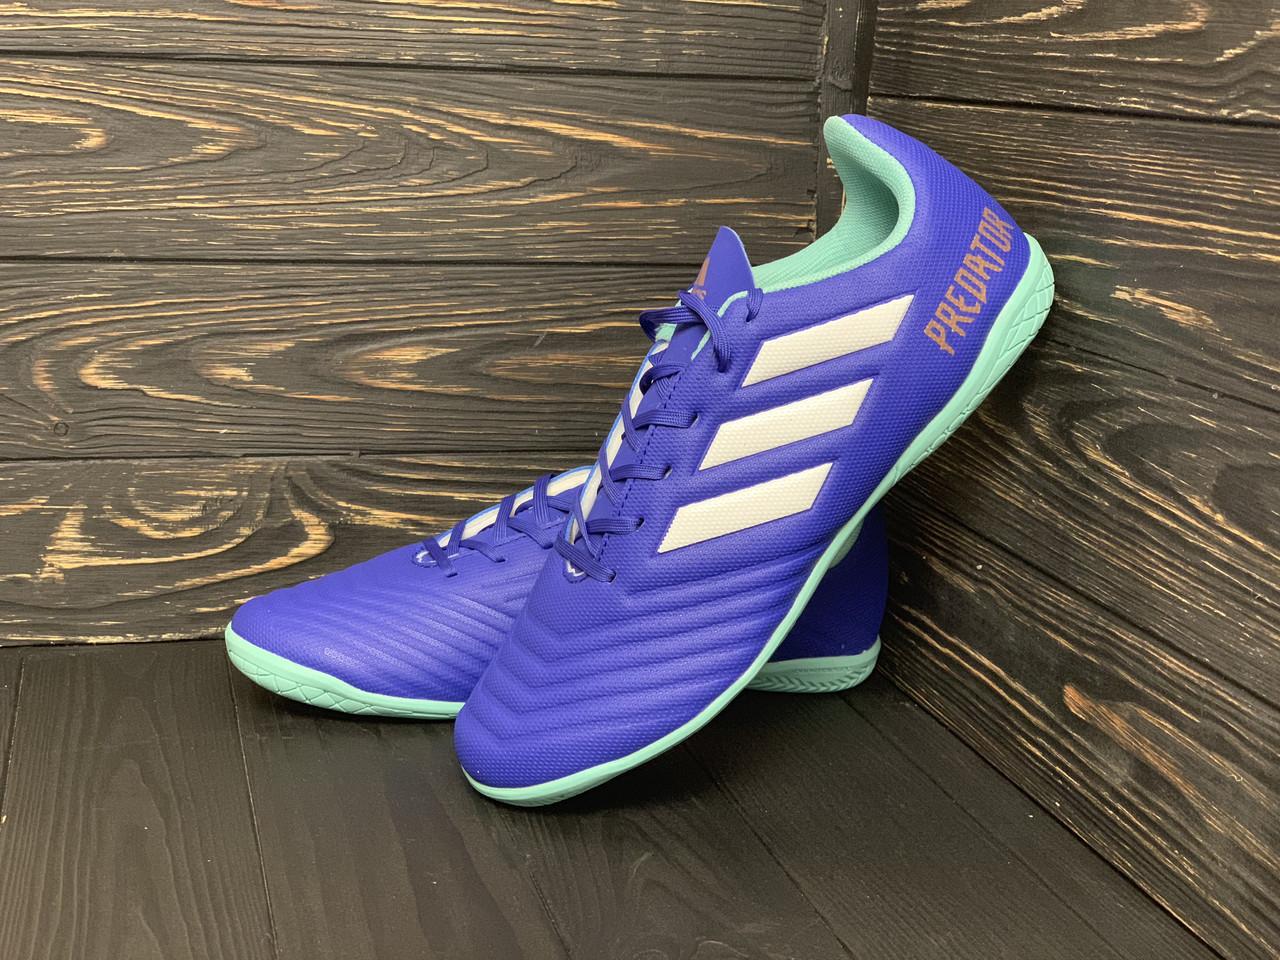 eff99fc0 Футзалки Adidas Predator Tango 18.4 In/ Бампы Адидас Предатор — в ...